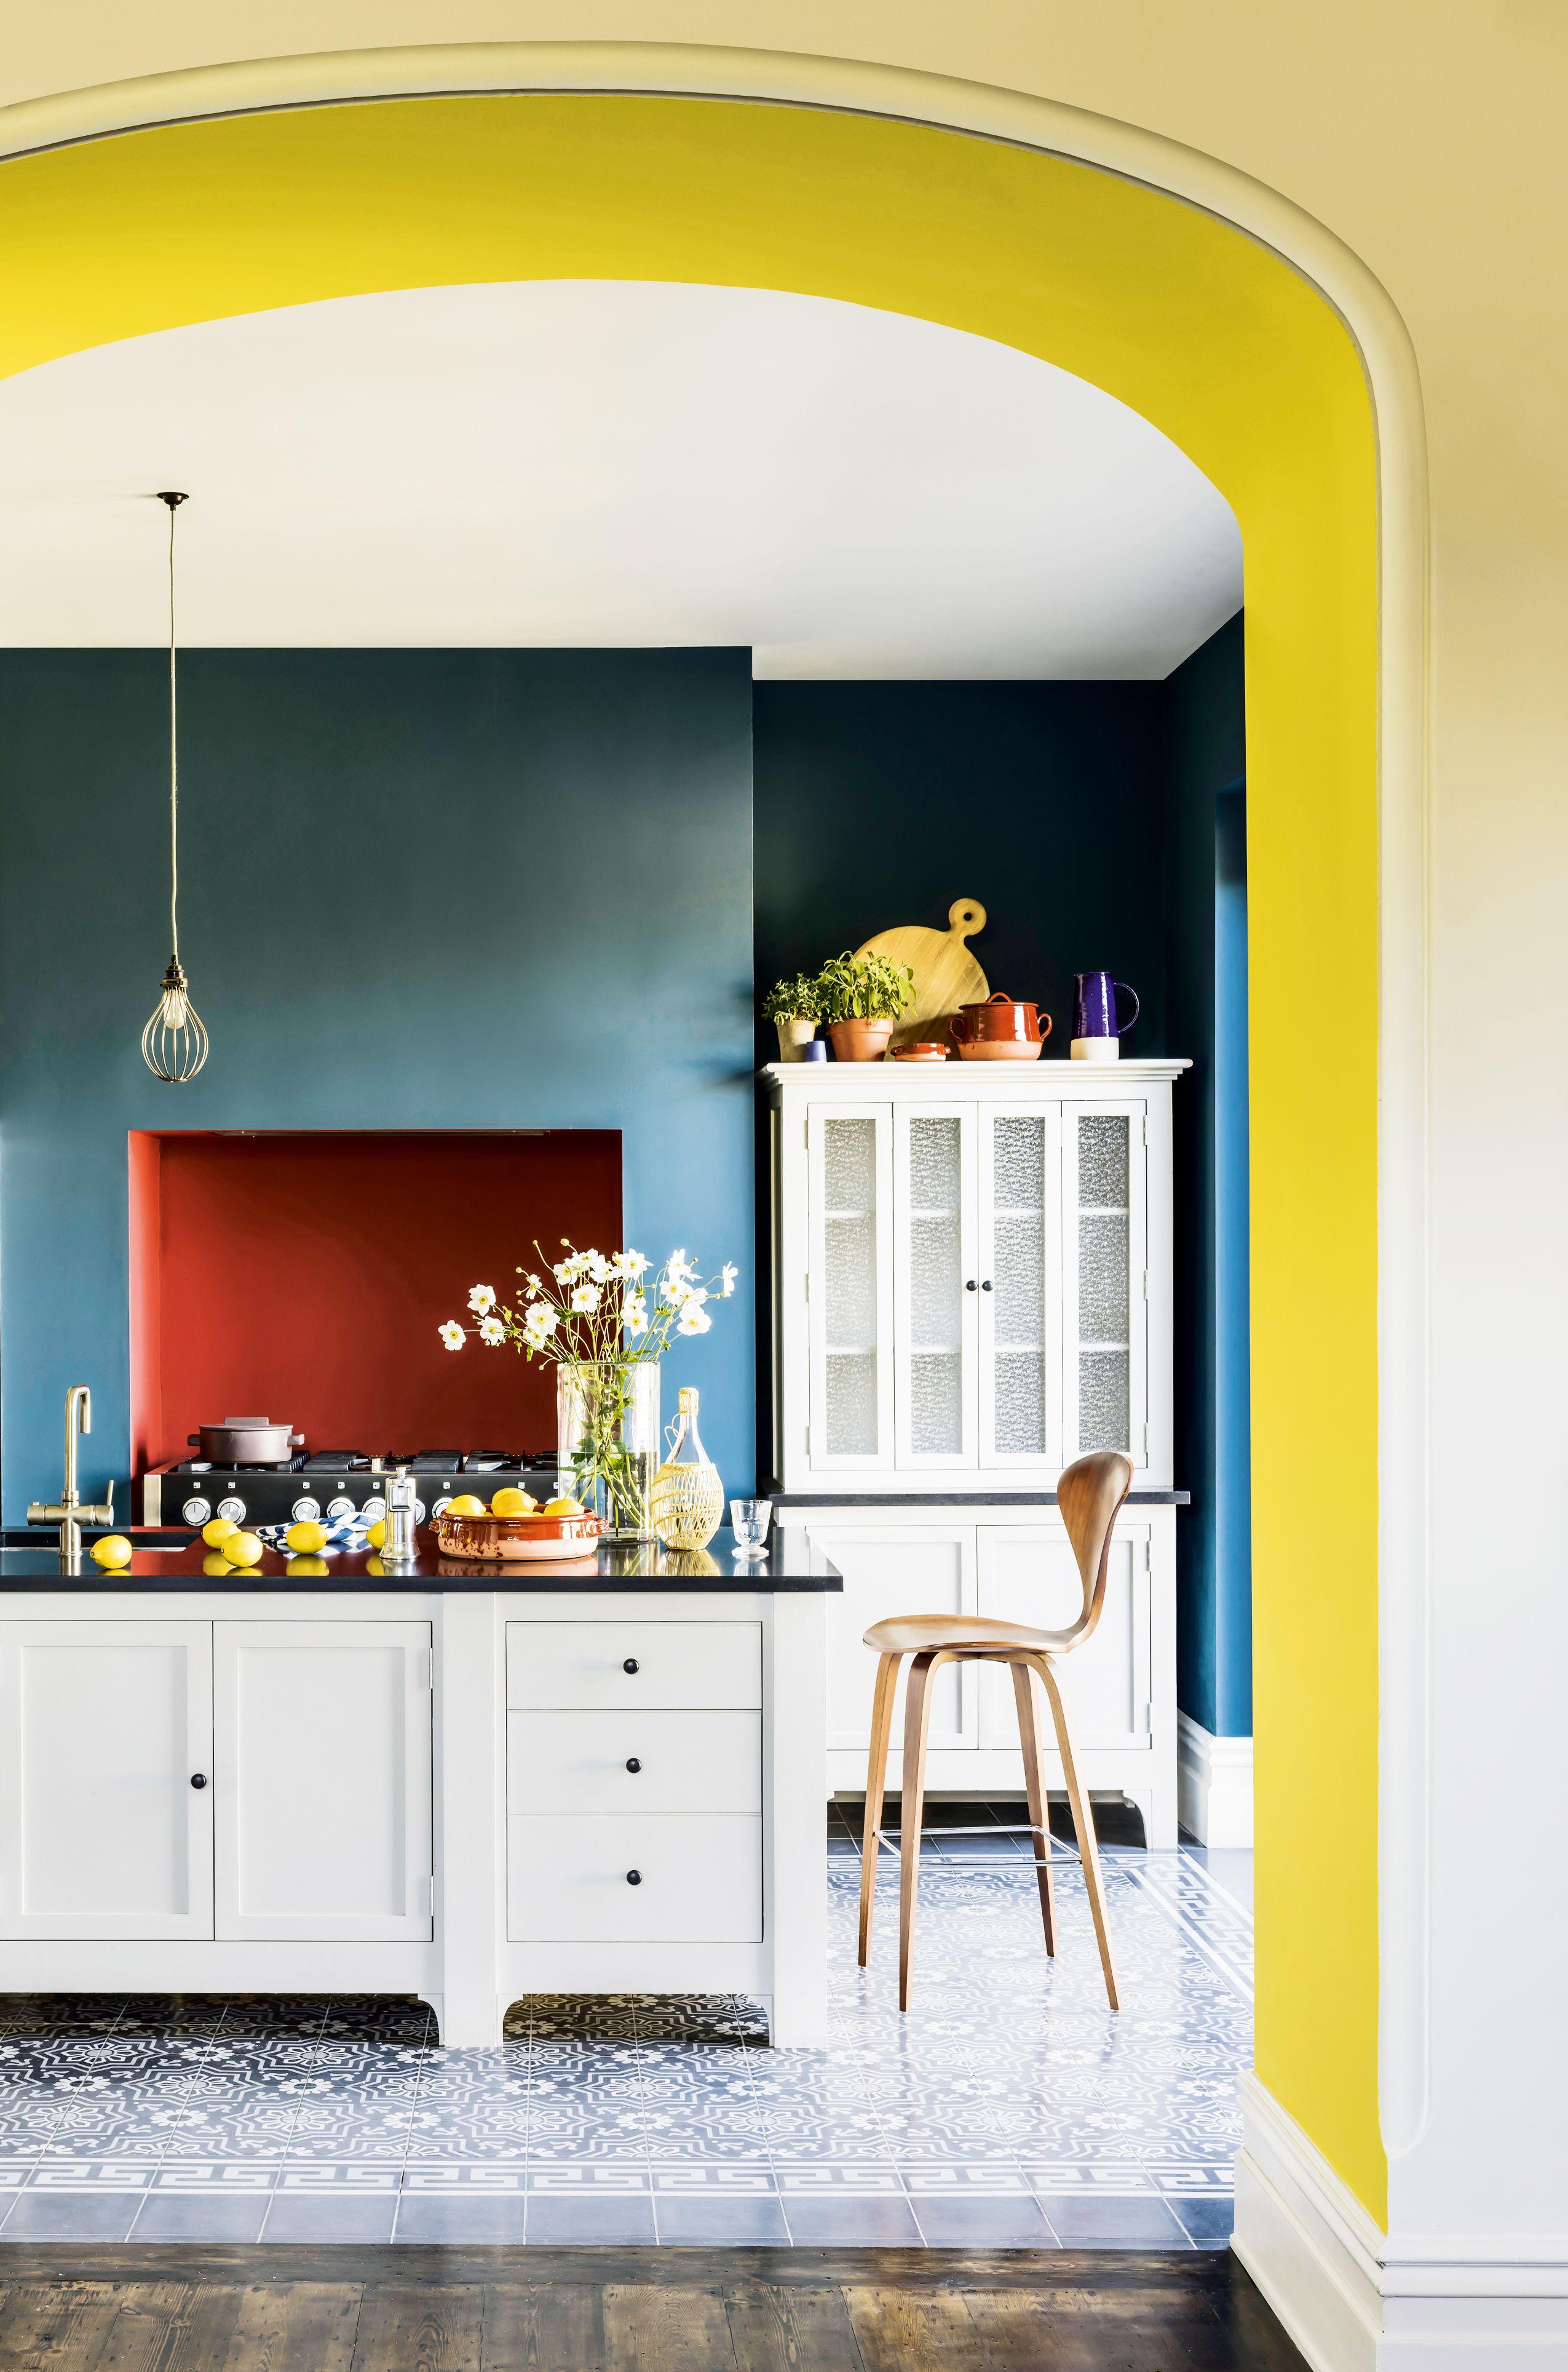 Inspiring Alcove Ideas Home Decor Kitchen House Interior